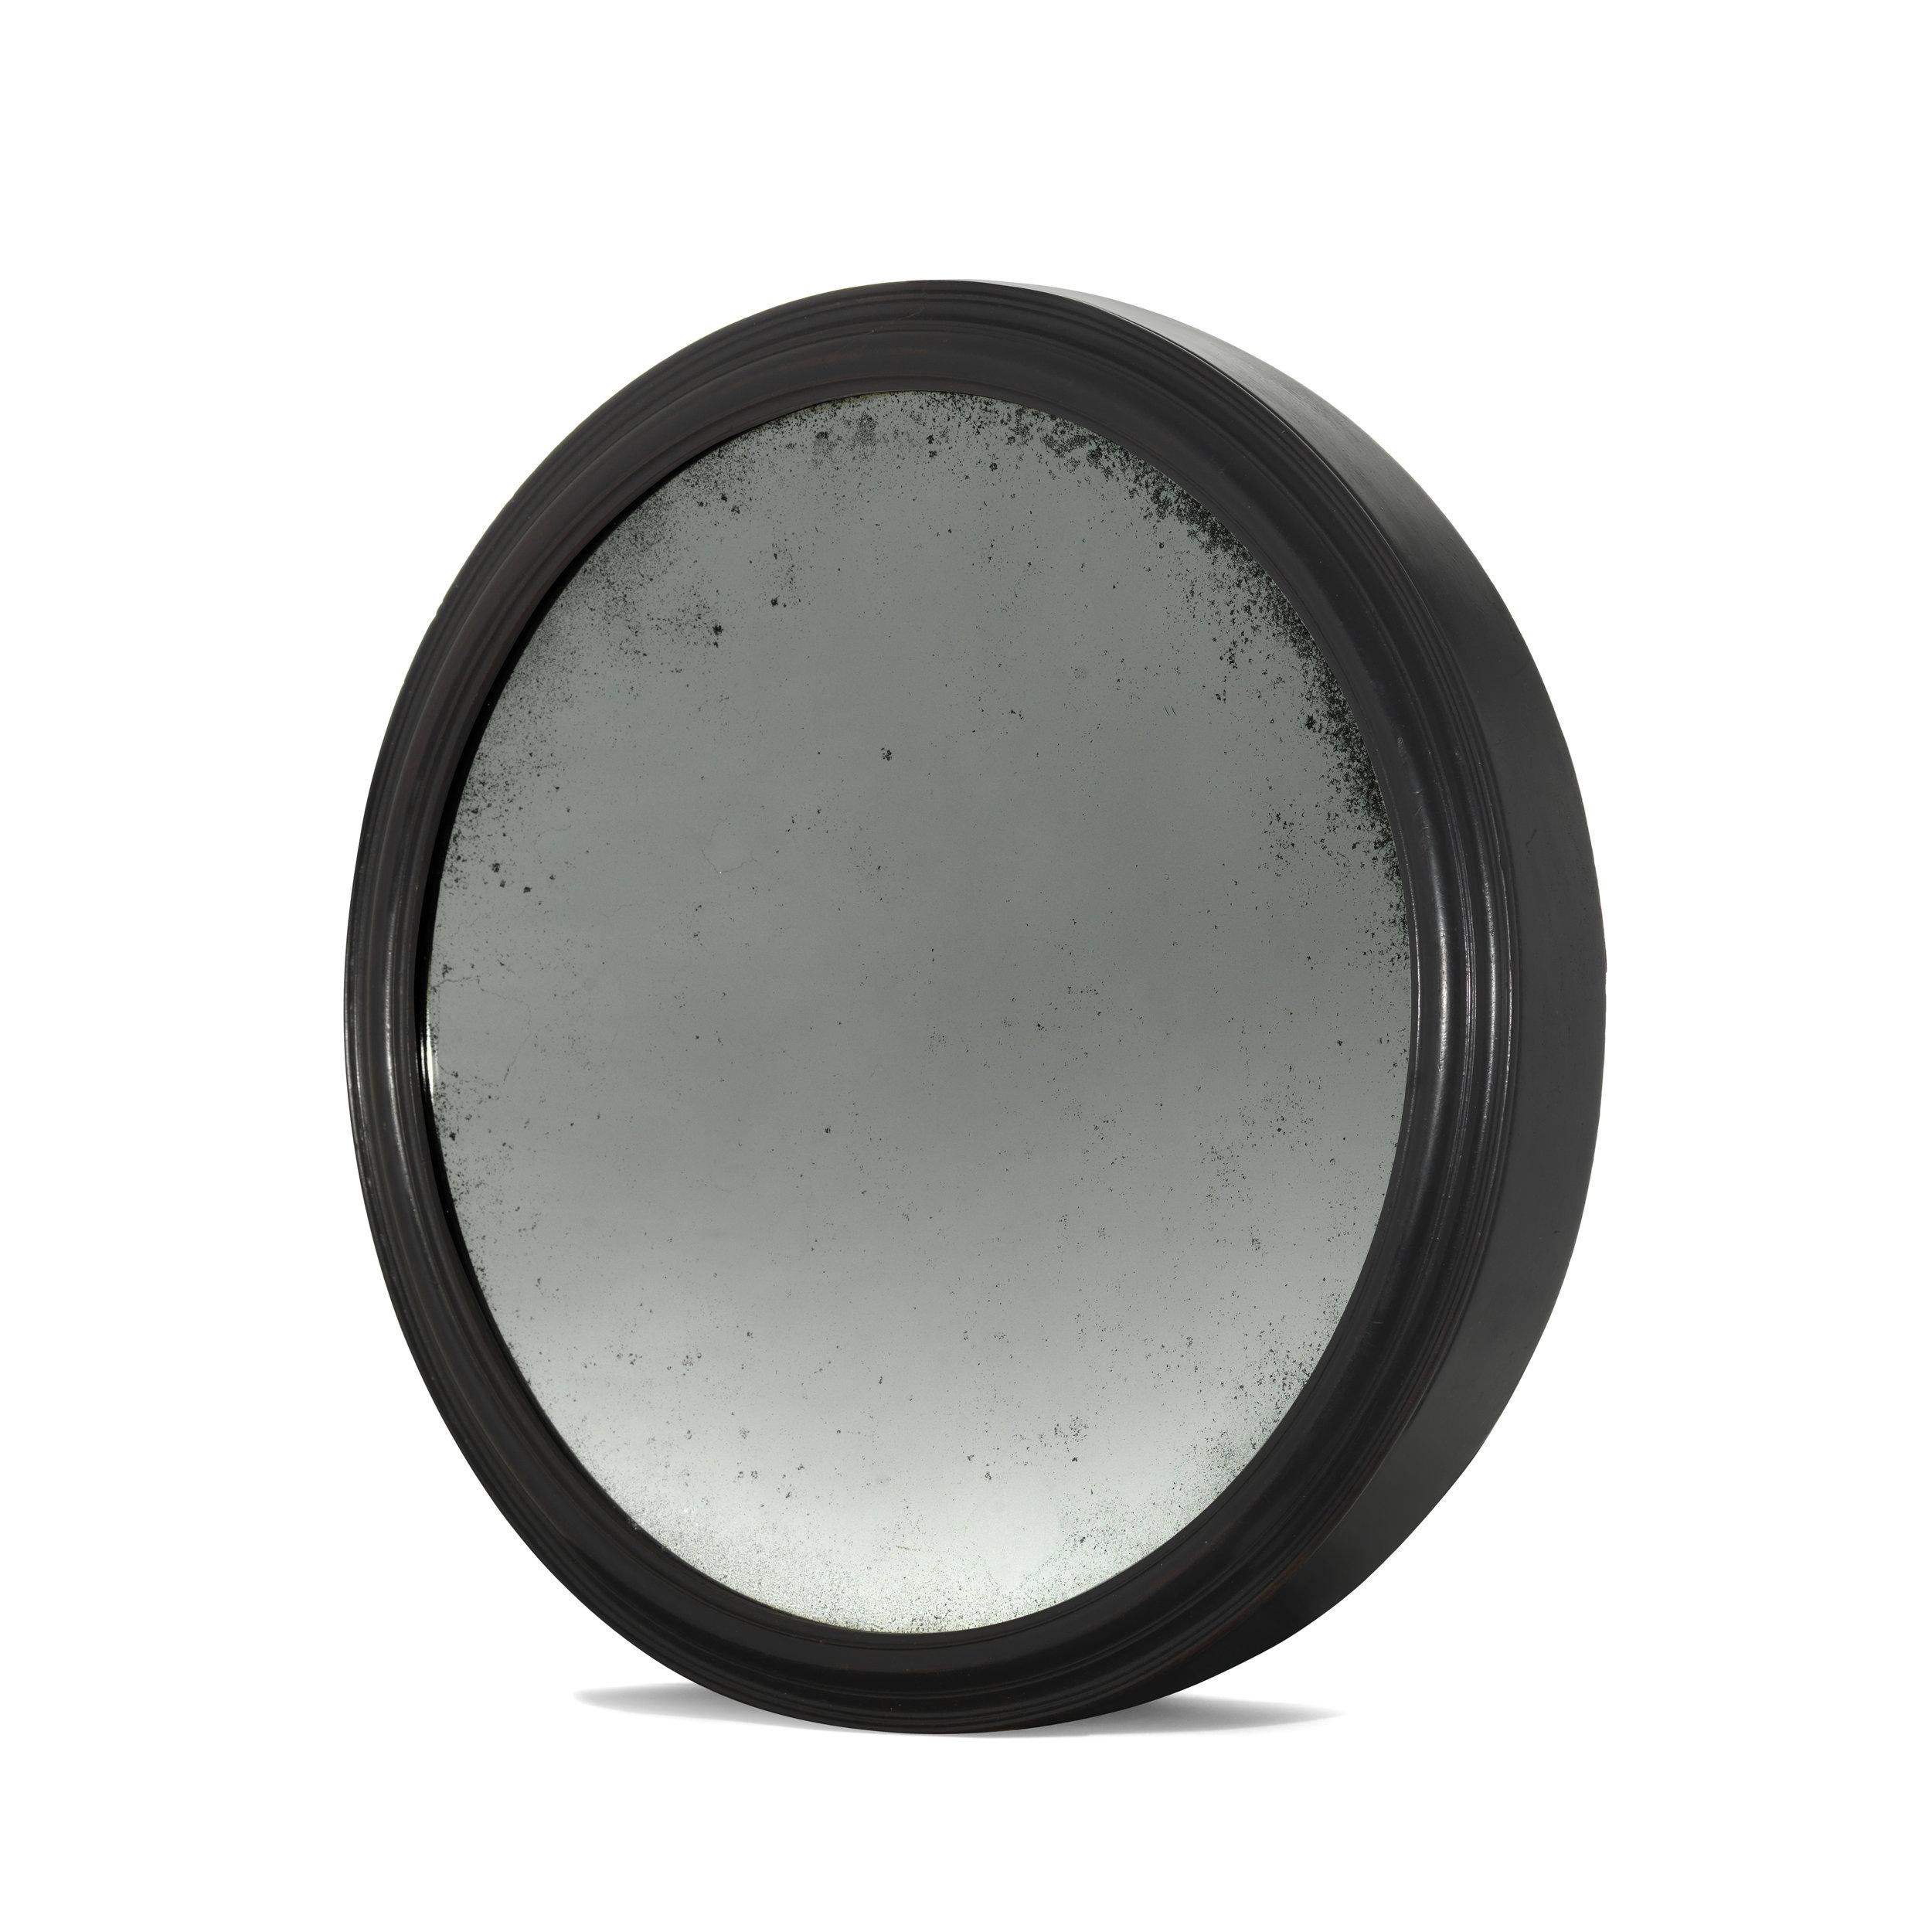 mirror_side (1).jpg